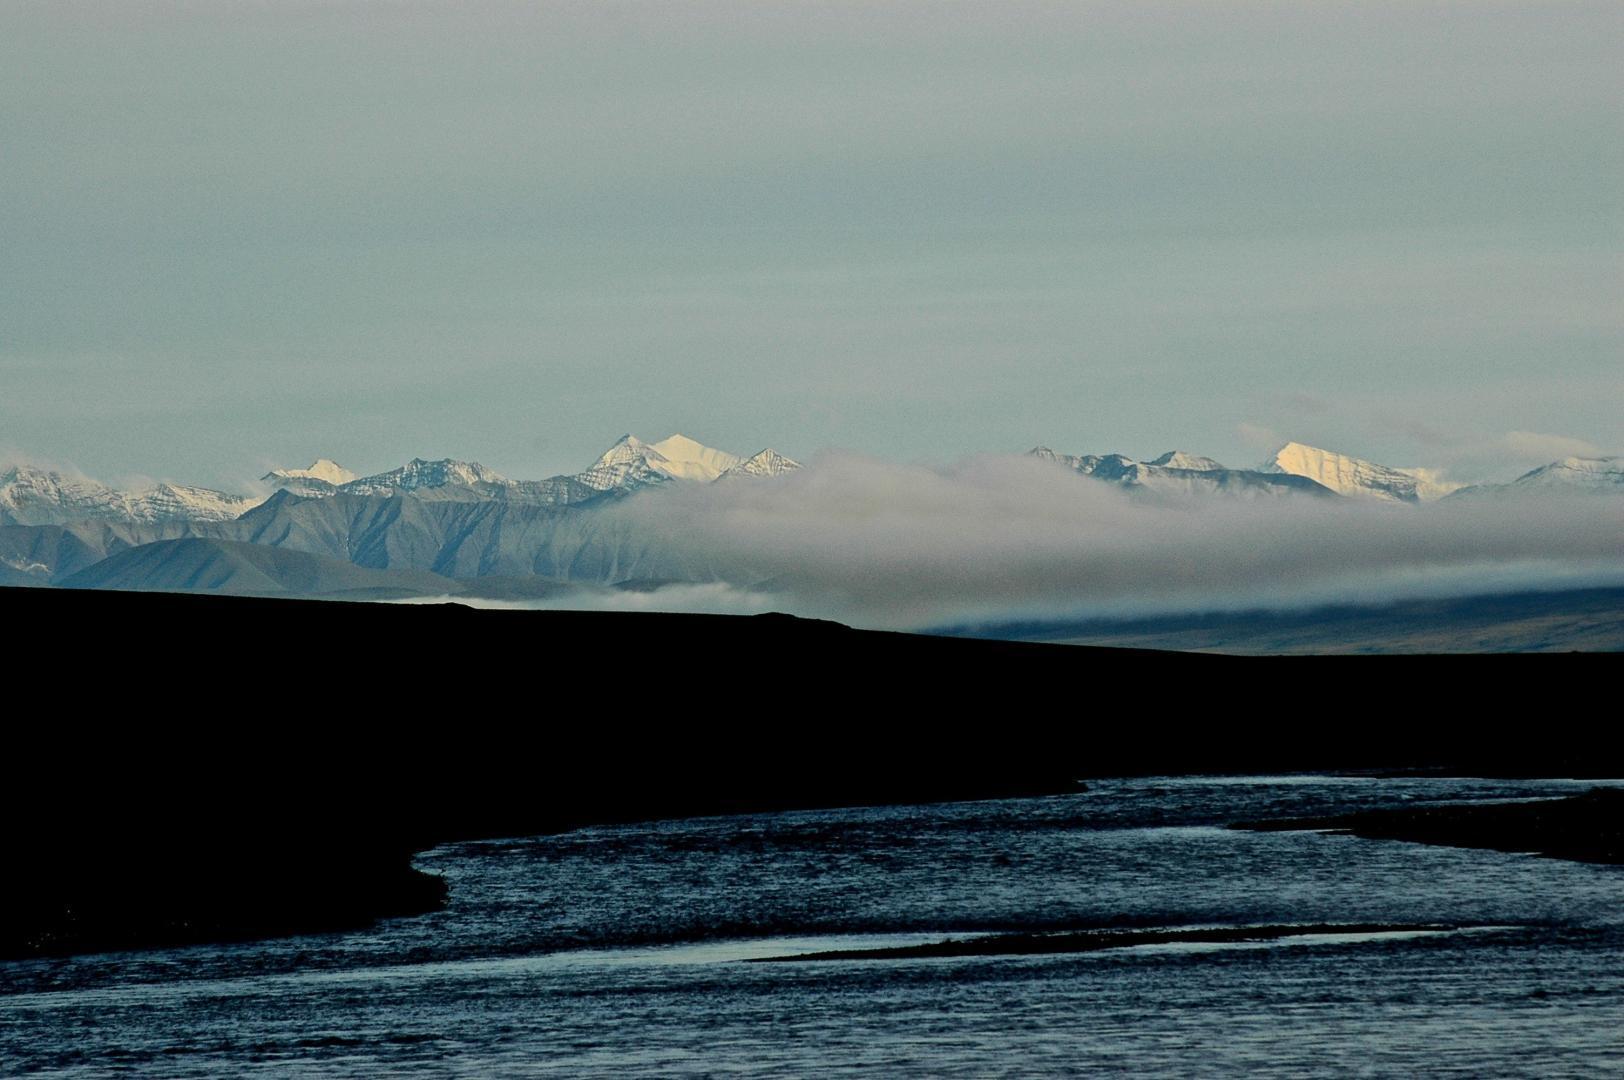 Snowy Brooks Range, Canning River, Arctic NWR © Dave Foreman